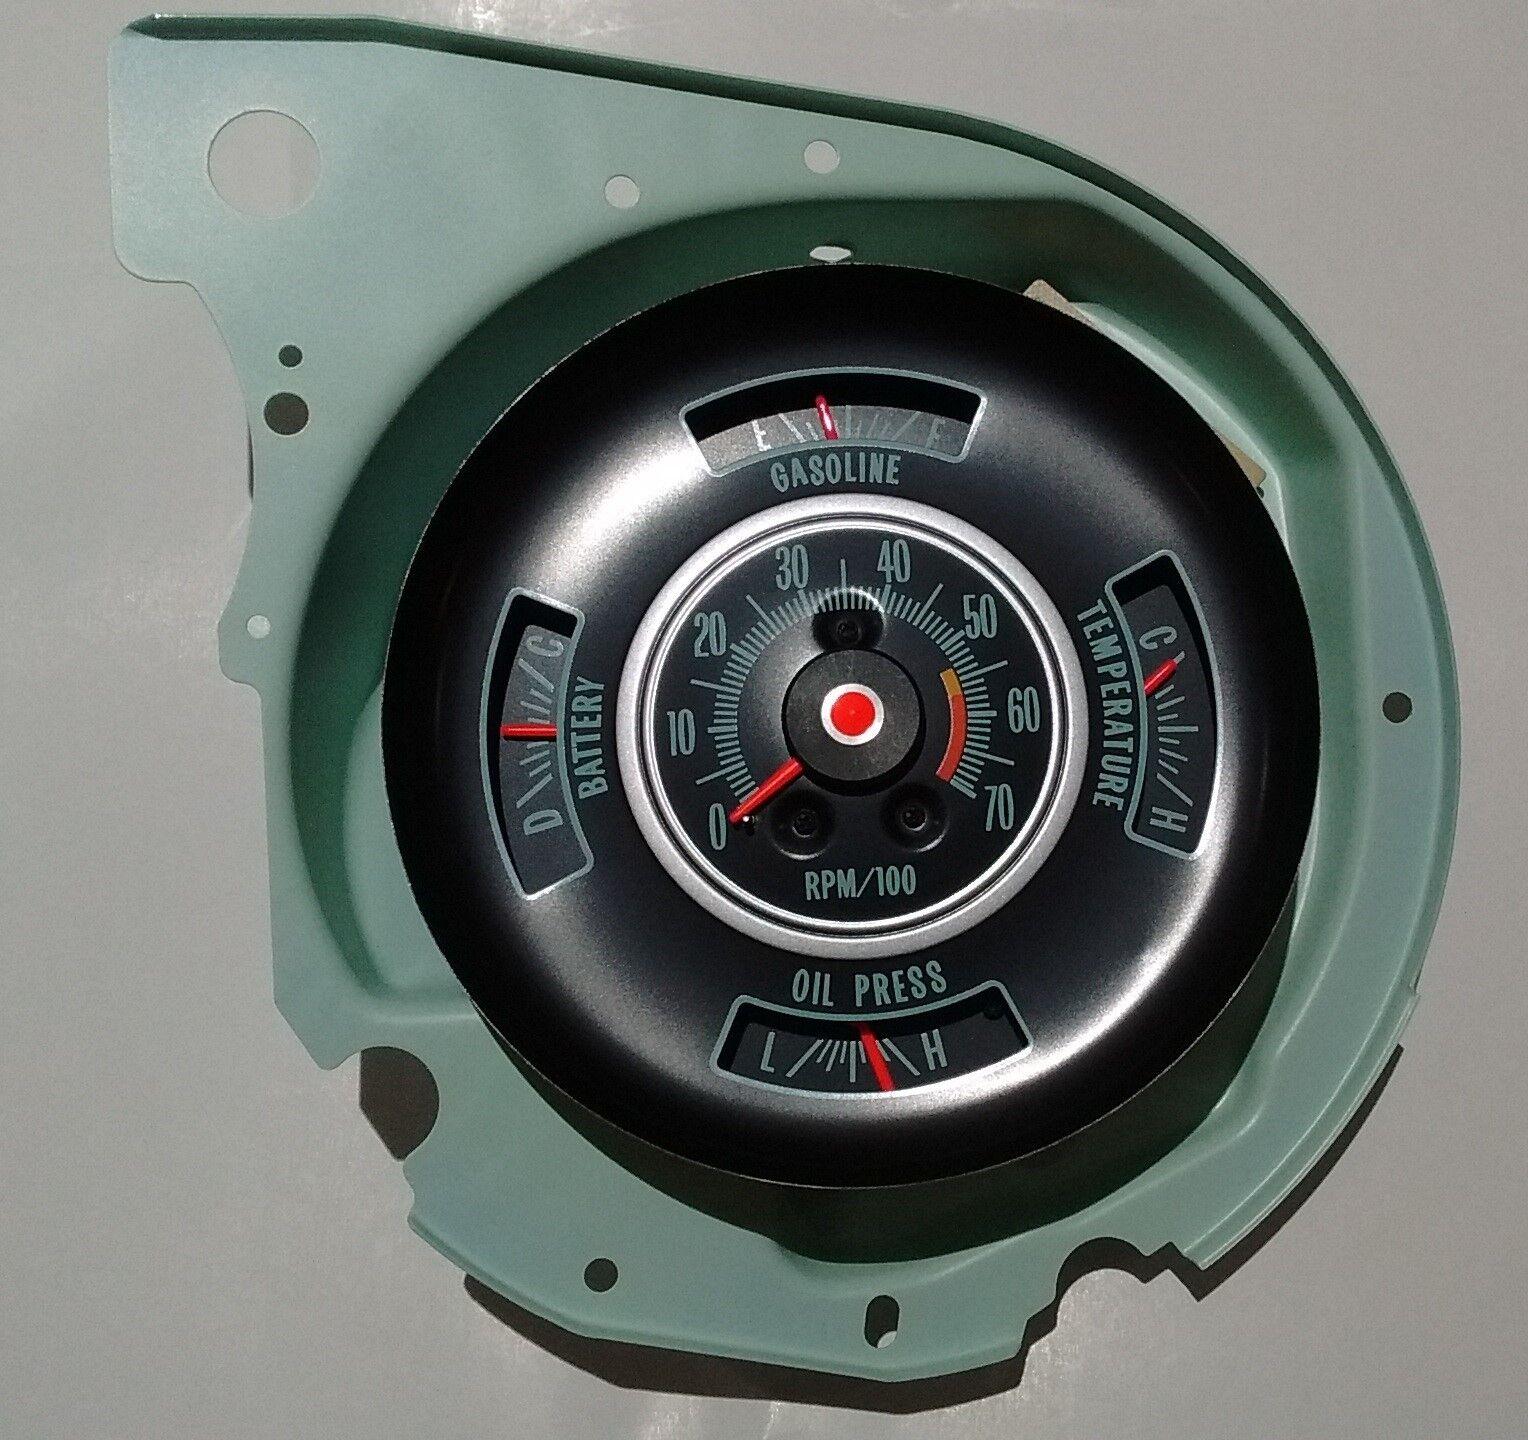 80 psi oil pressure sending unit 69 72 chevy chevelle nova camaro tachometer dash gauge 69 chevy chevelle bu el camino 5700 rpm tach gauges